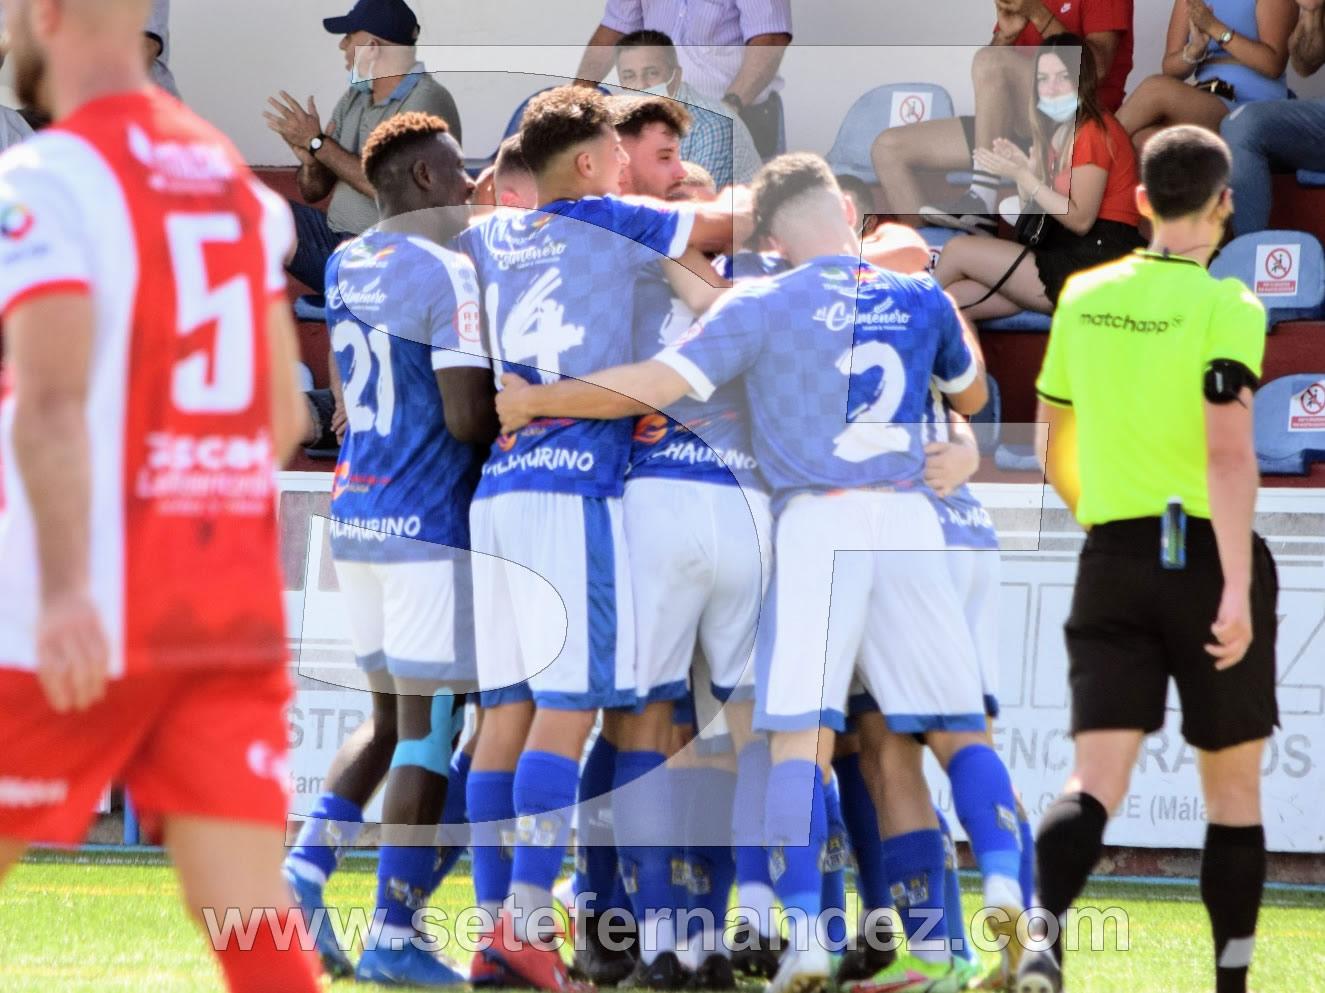 El CD Alhaurino celebrando el primer gol de esta temporada